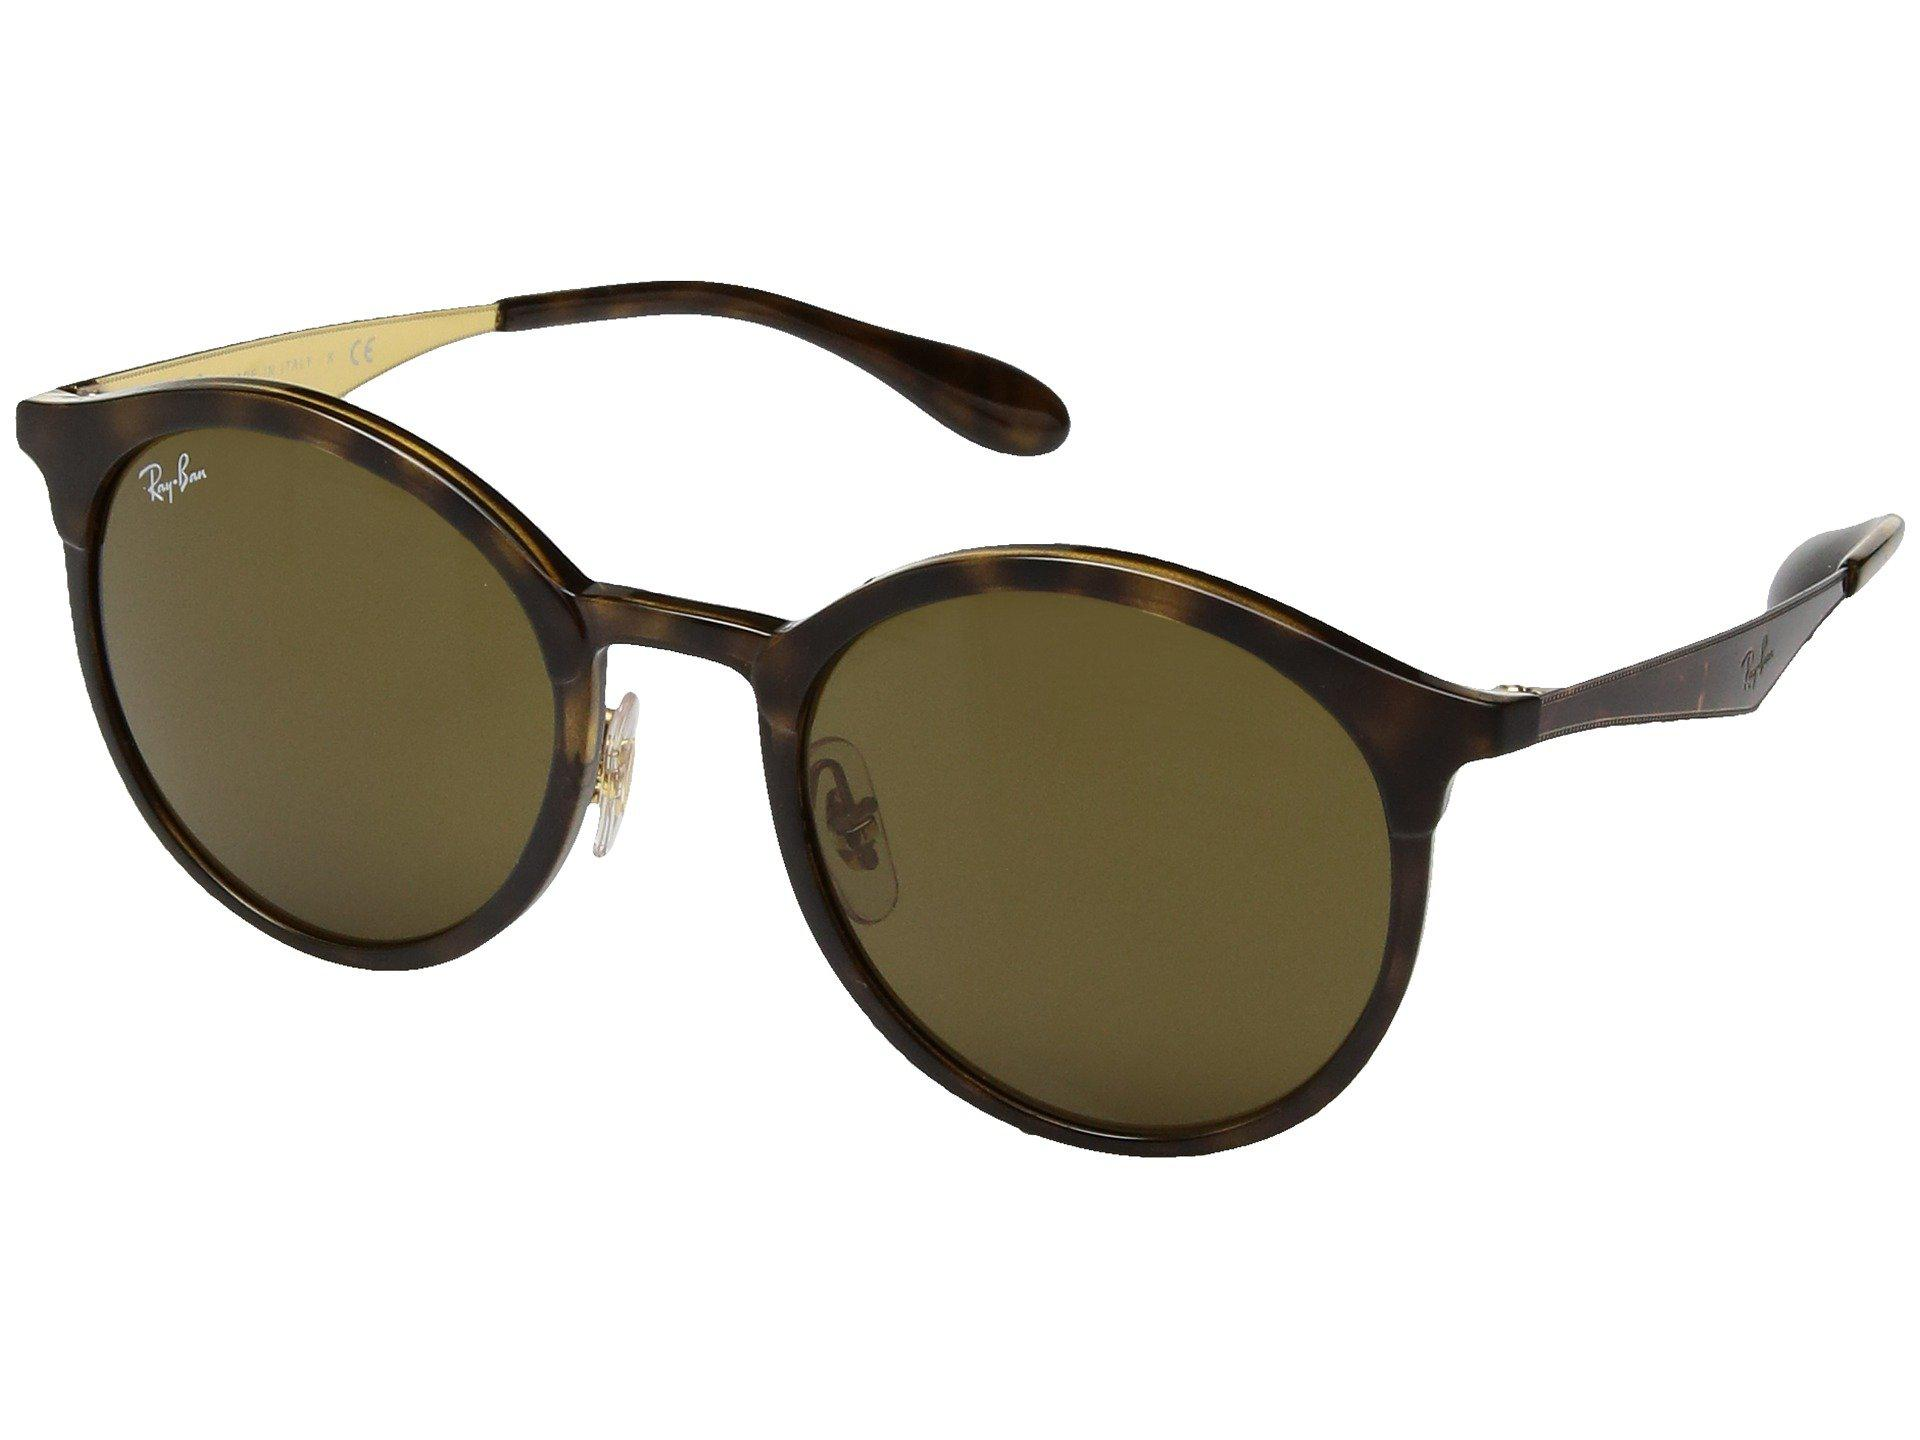 d1302c80b6 Ray-Ban. Women s Rb4277 Emma 51mm (havana dark Brown) Fashion Sunglasses